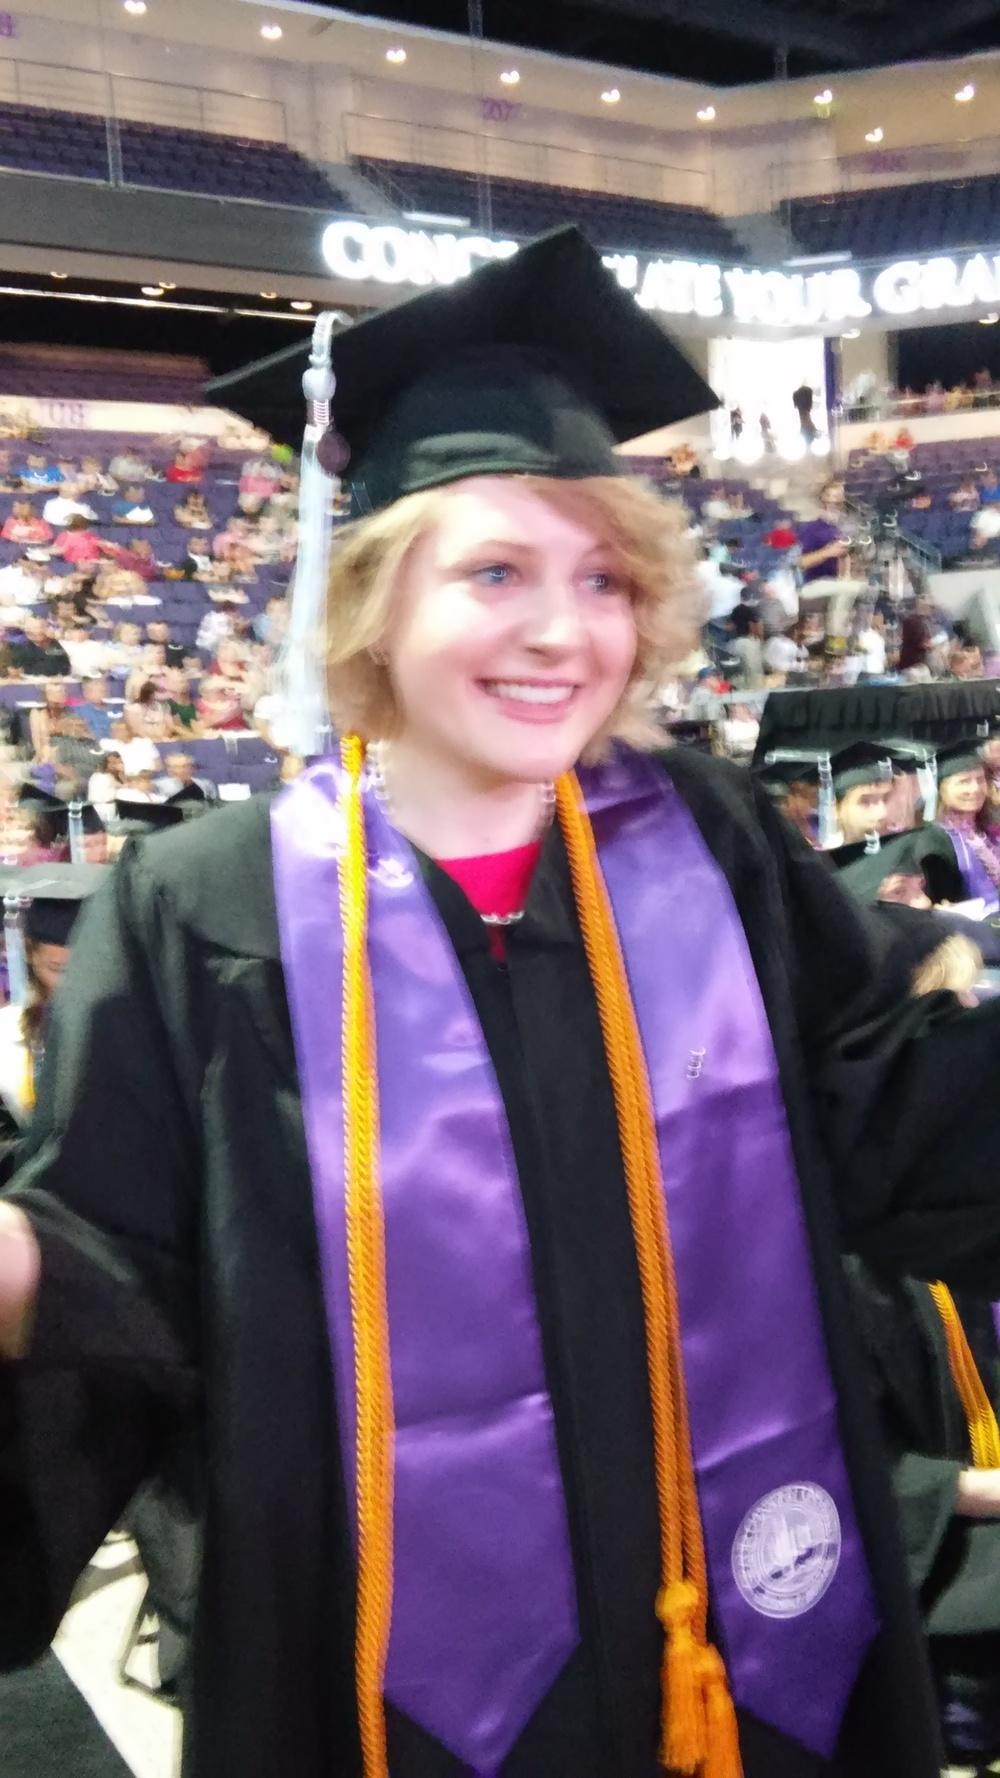 The Graduate!